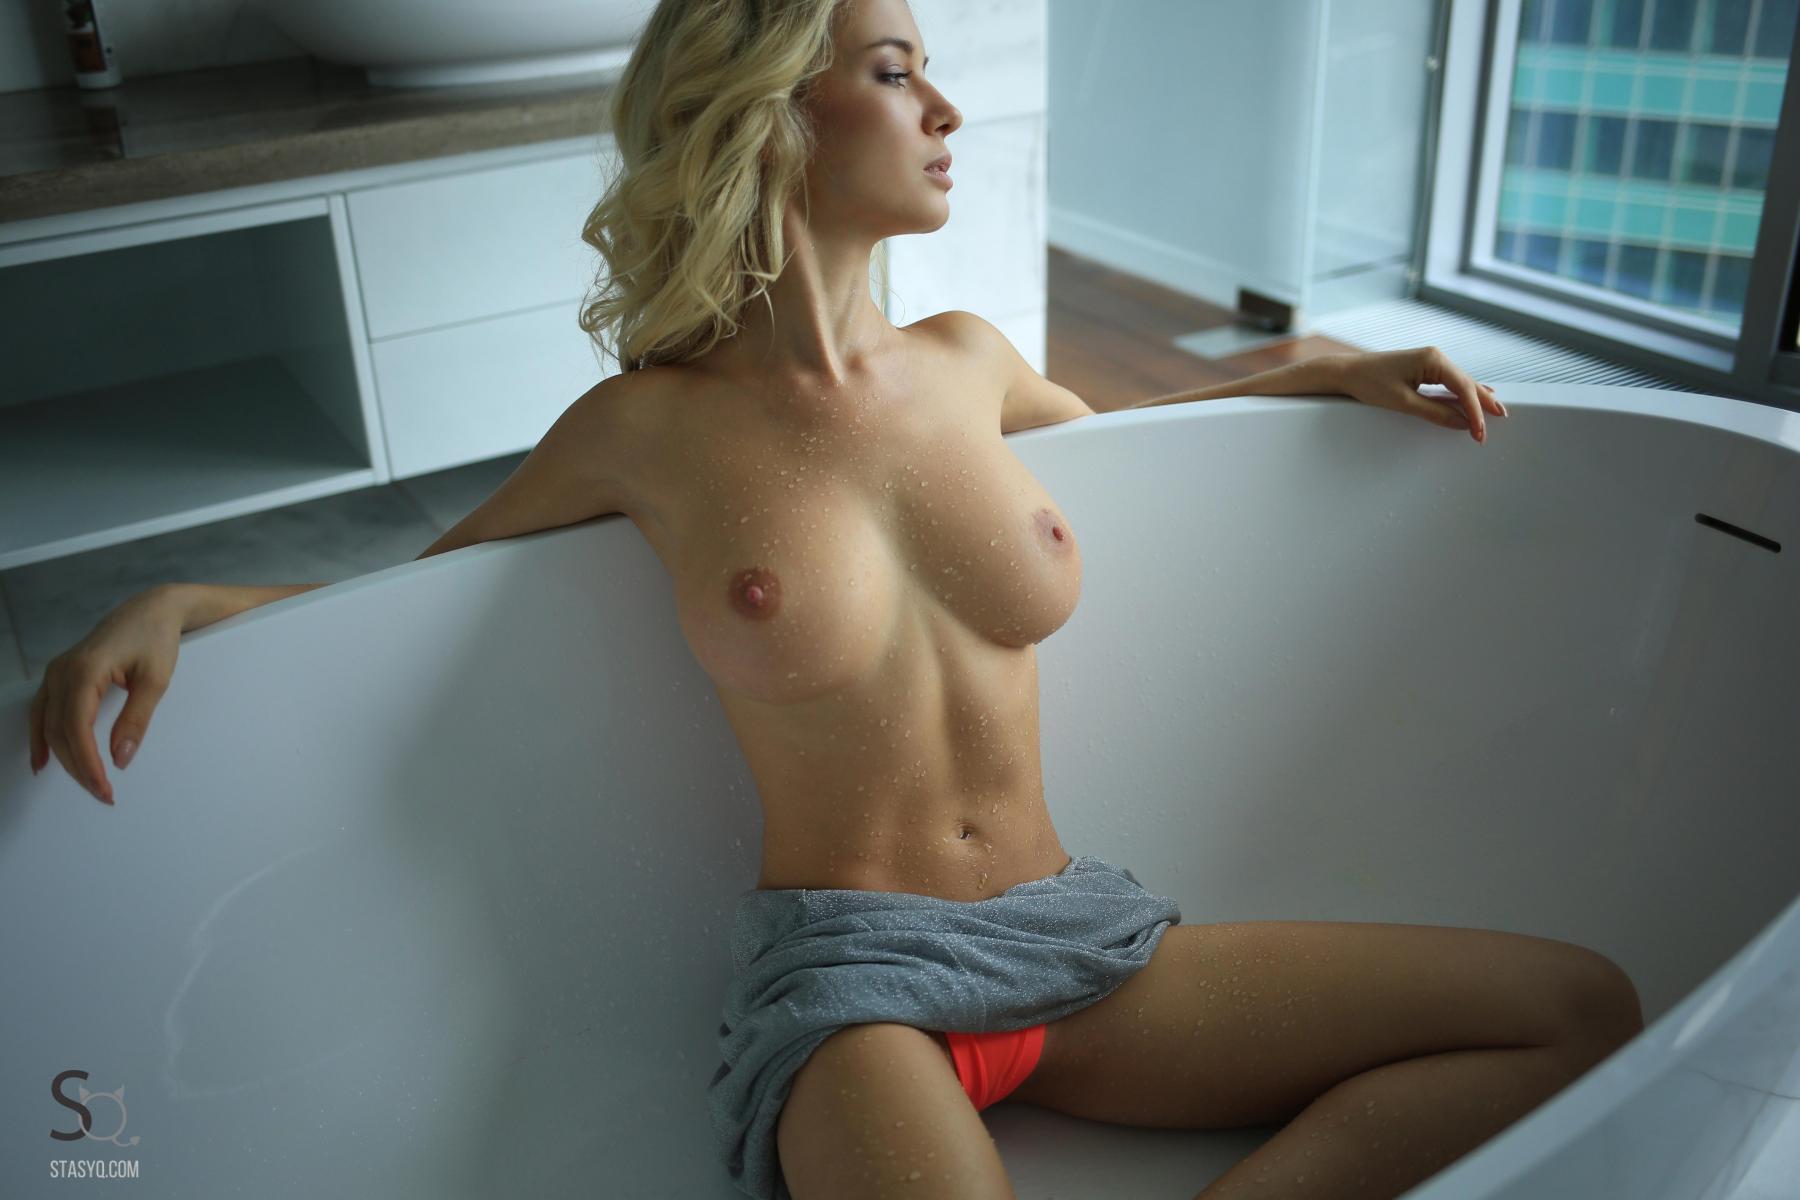 monroq-blonde-boobs-naked-bathroom-window-stasyq-23